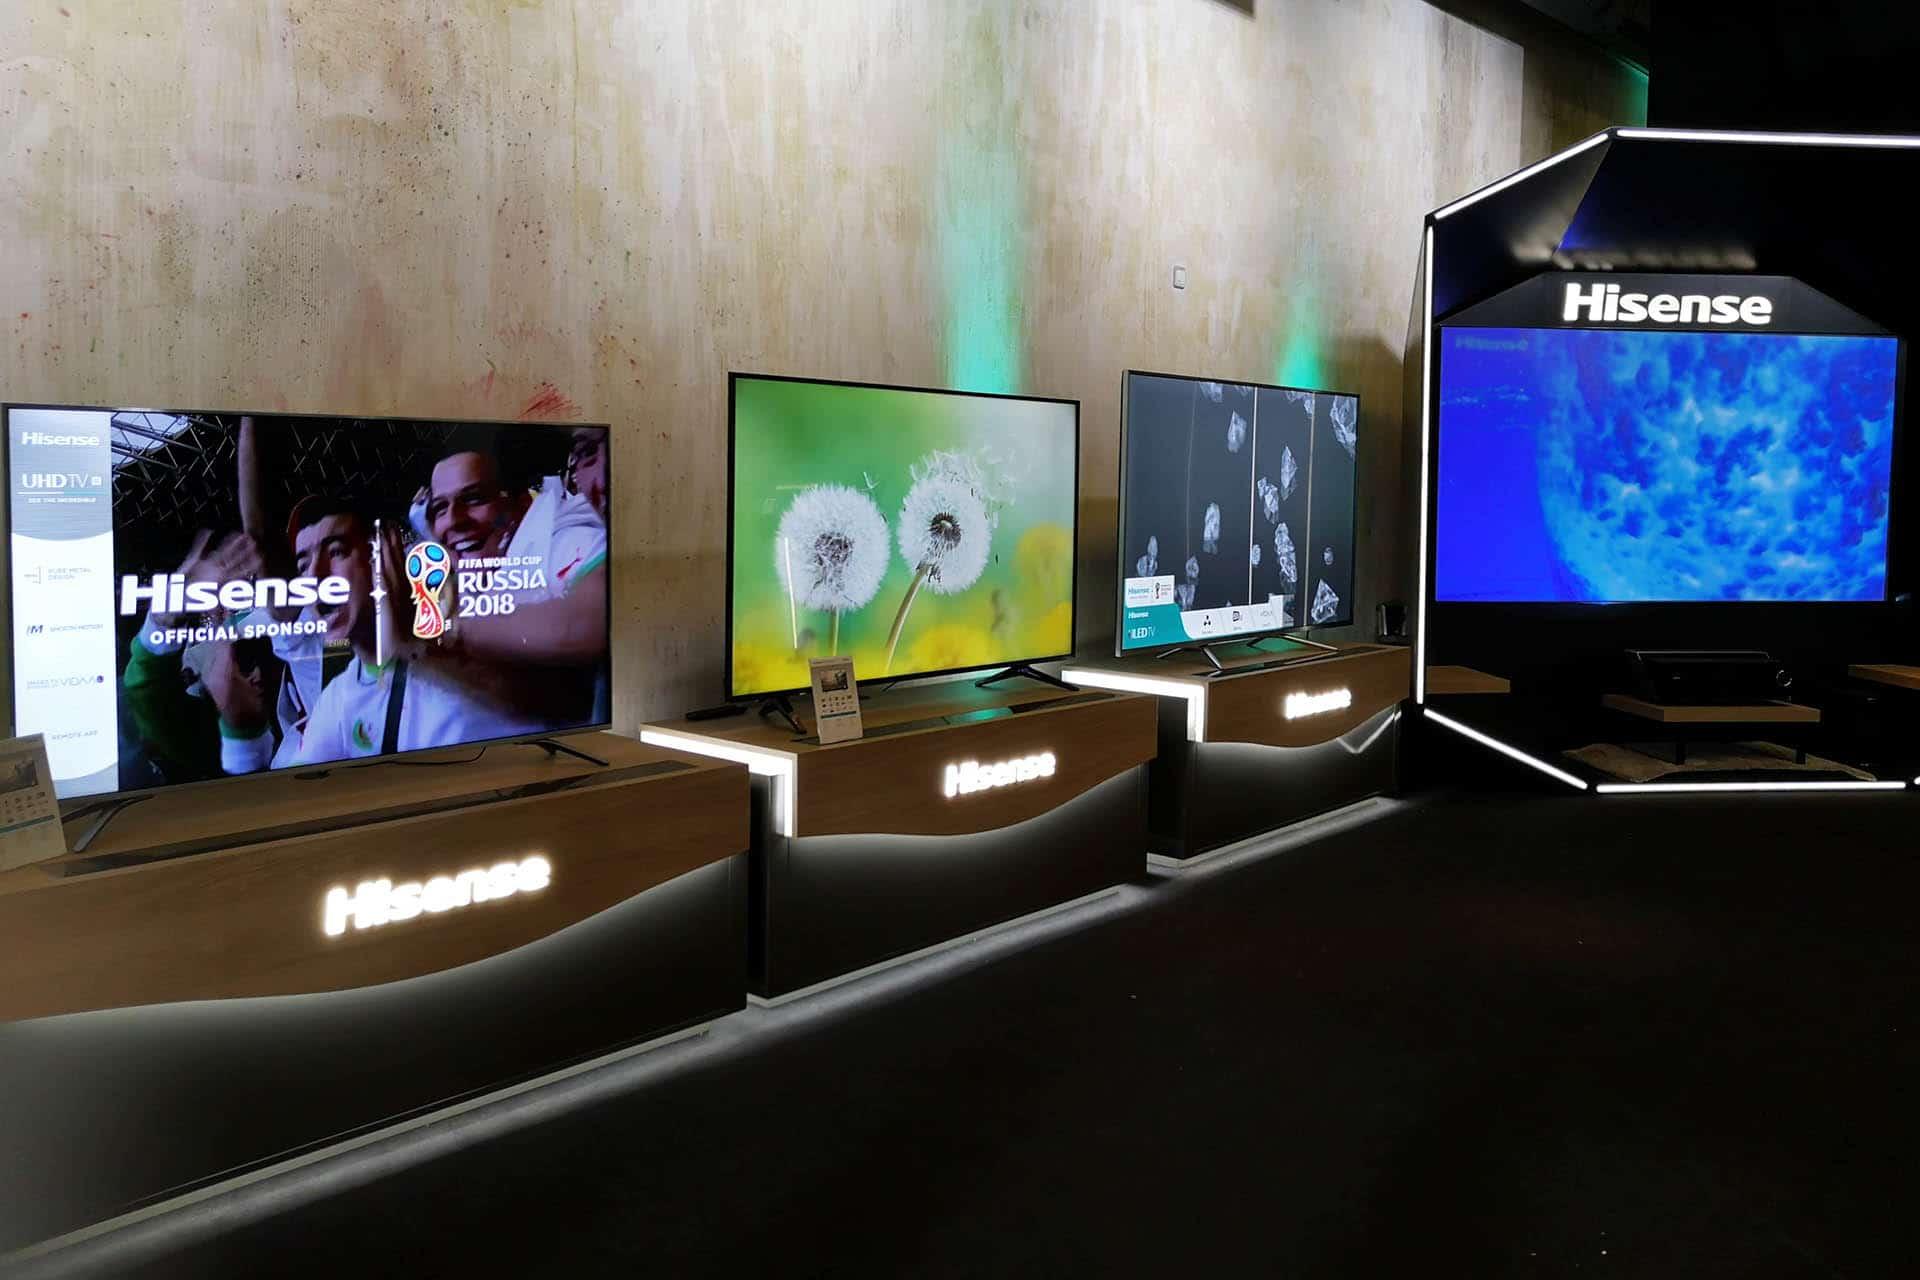 hisense lança laser tv de 100 polegadas - Hisense Laser TV 03 - Hisense lança Laser TV de 100 polegadas